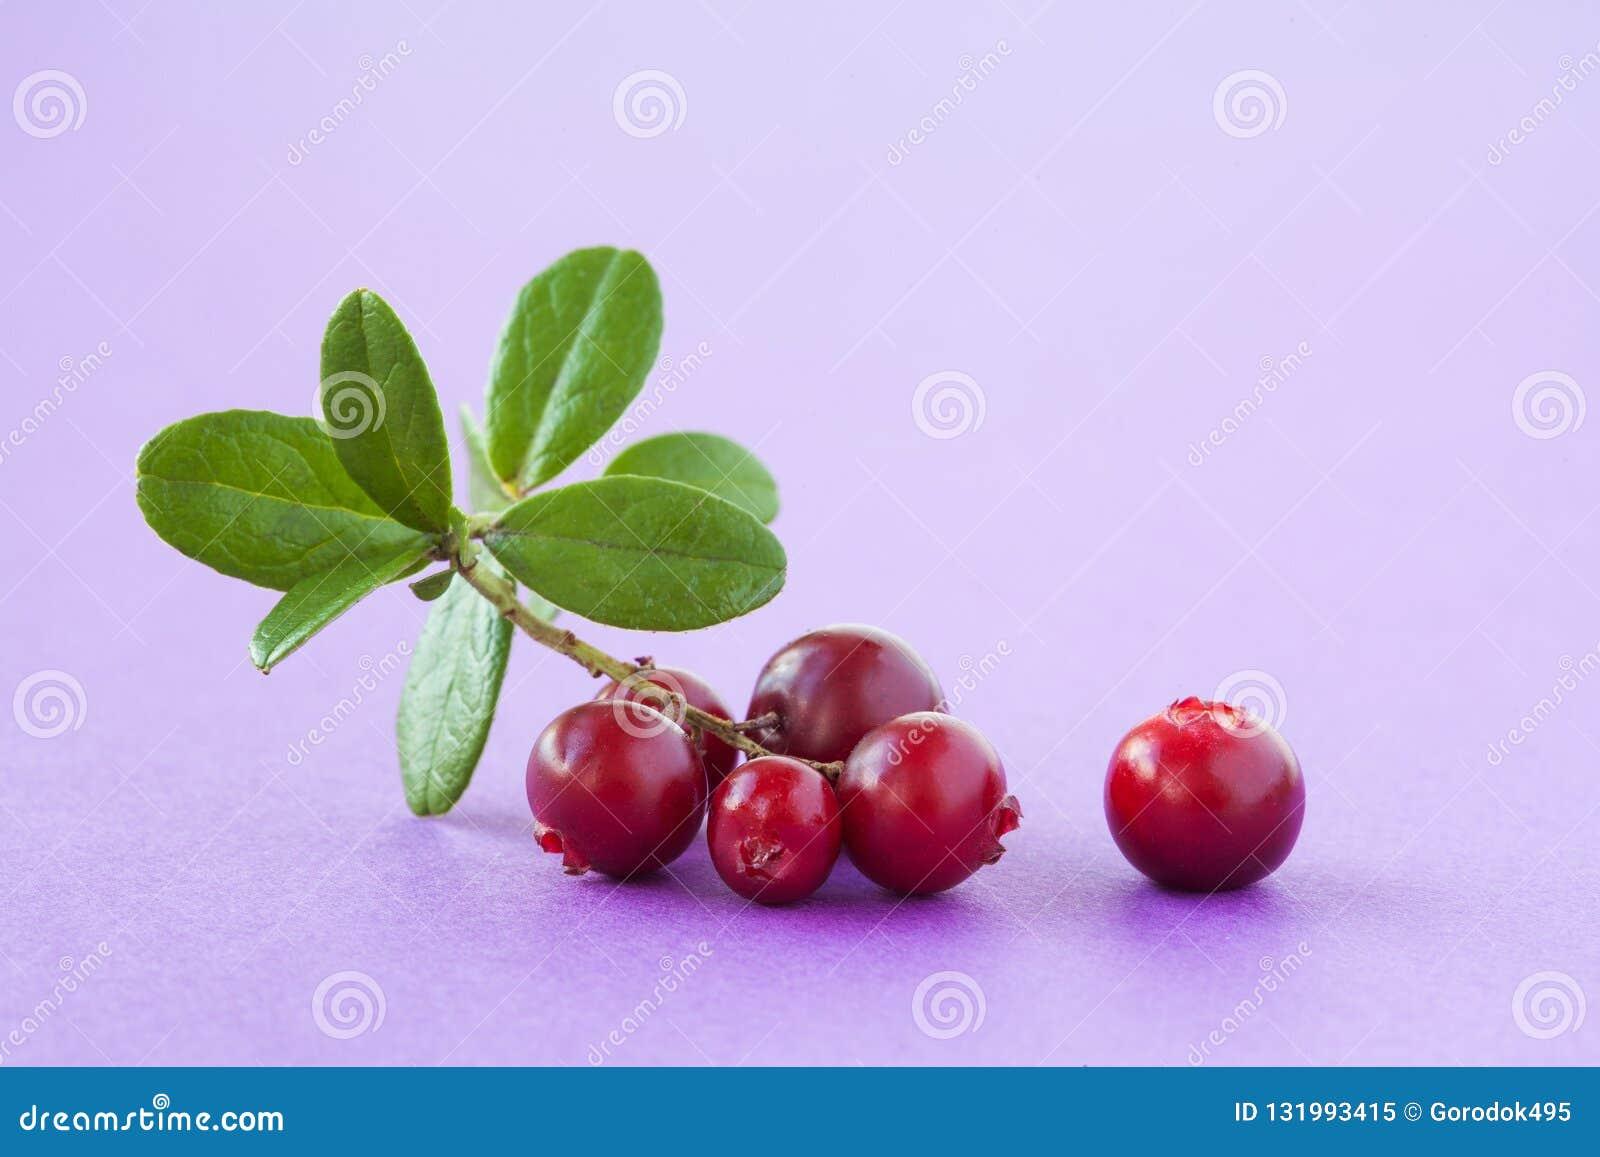 32 Wild Redberry Photos   Free & Royalty Free Stock Photos from ...